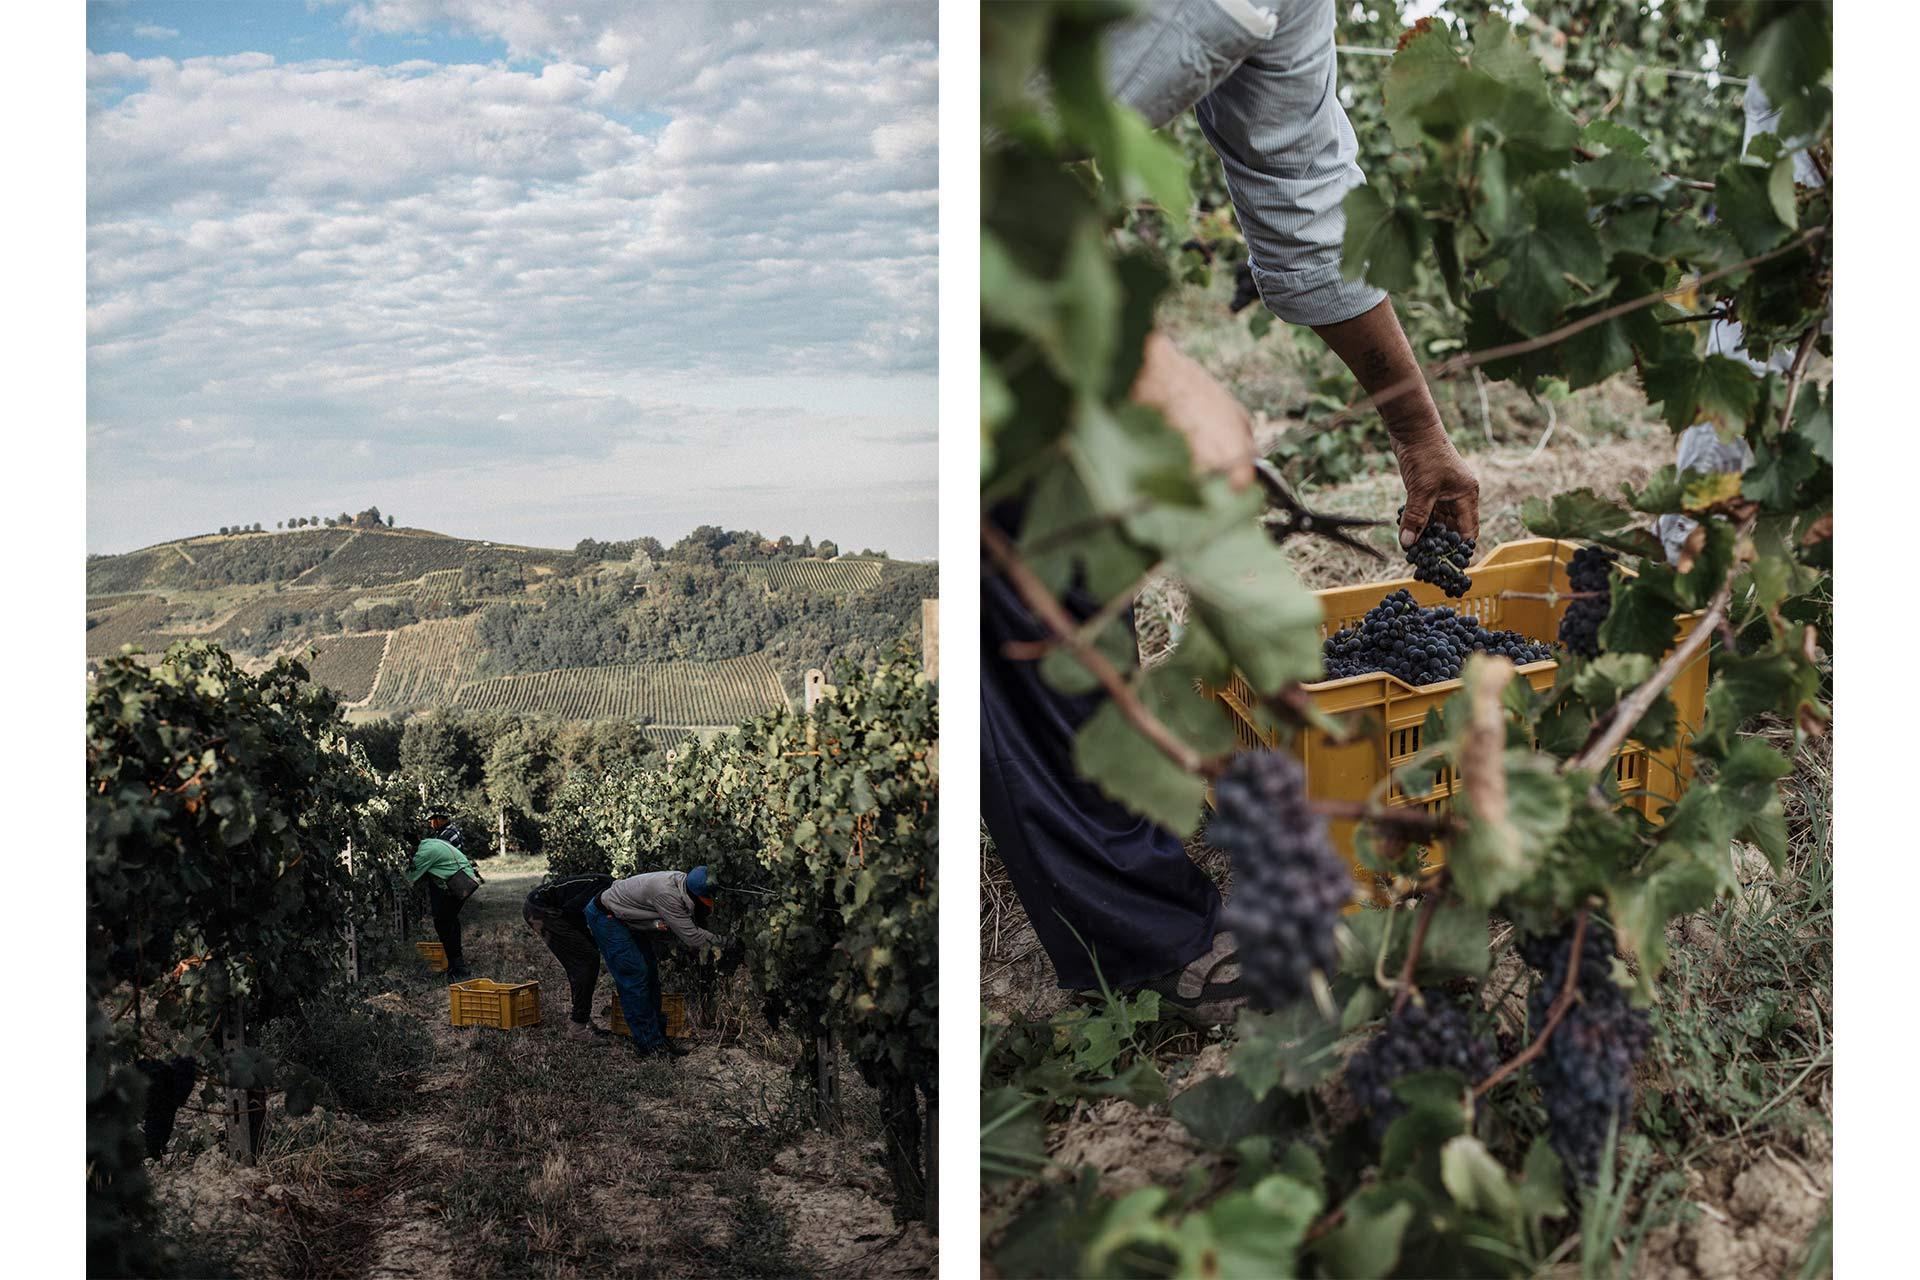 Wine Harvesting in vineyard